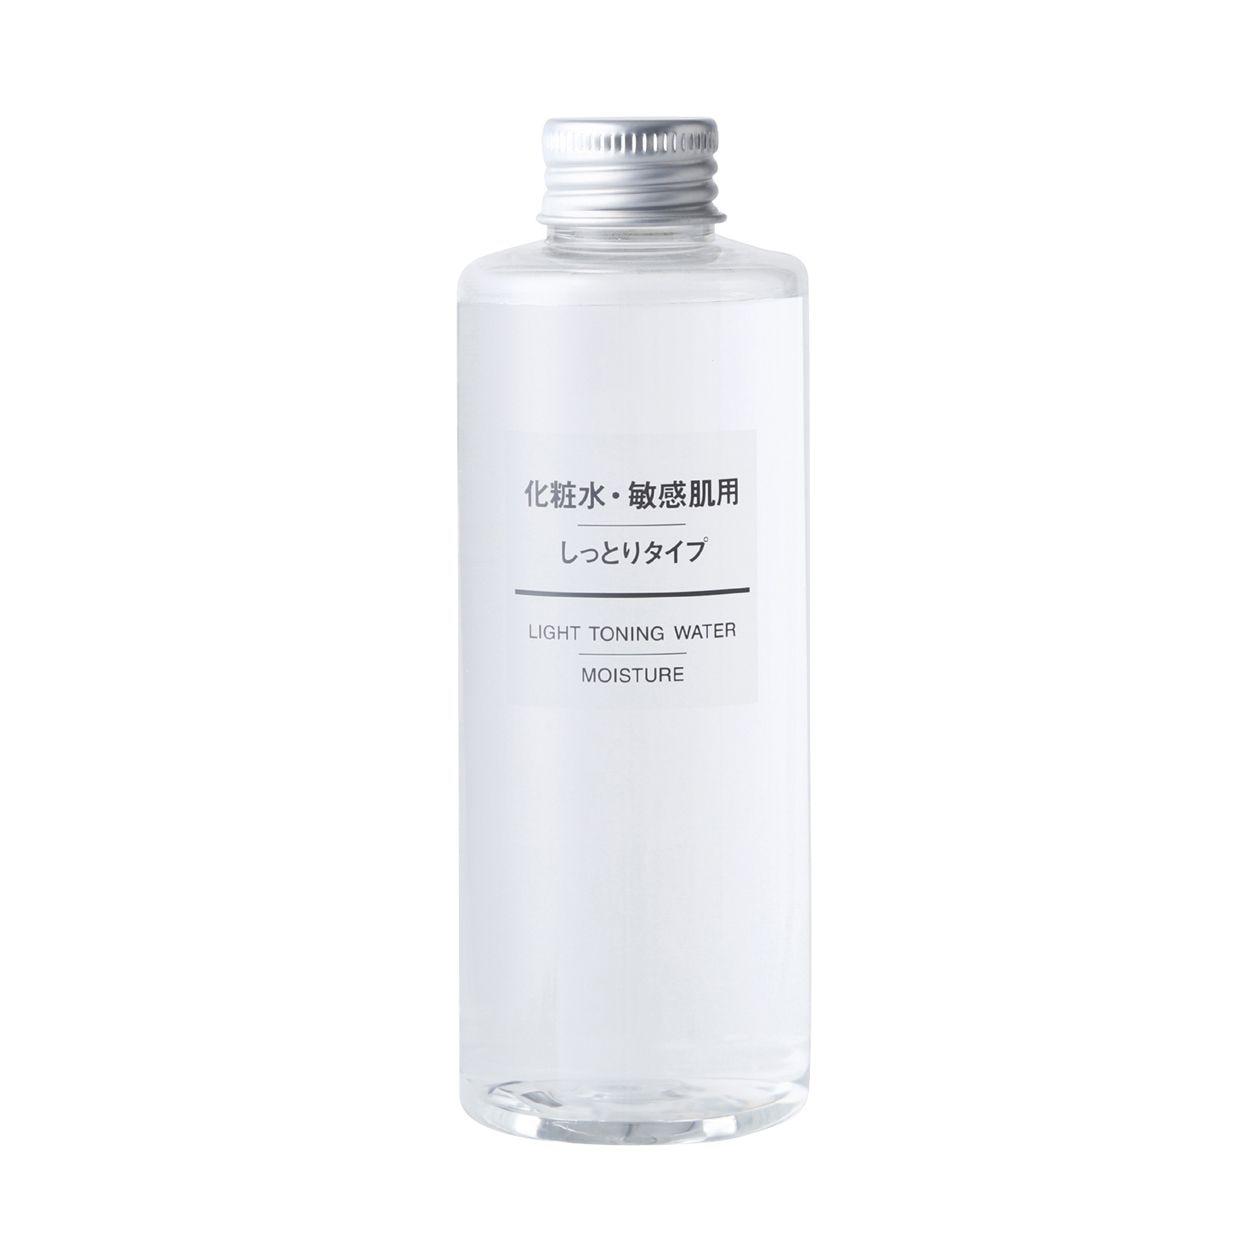 RoomClip商品情報 - 化粧水・敏感肌用・しっとりタイプ